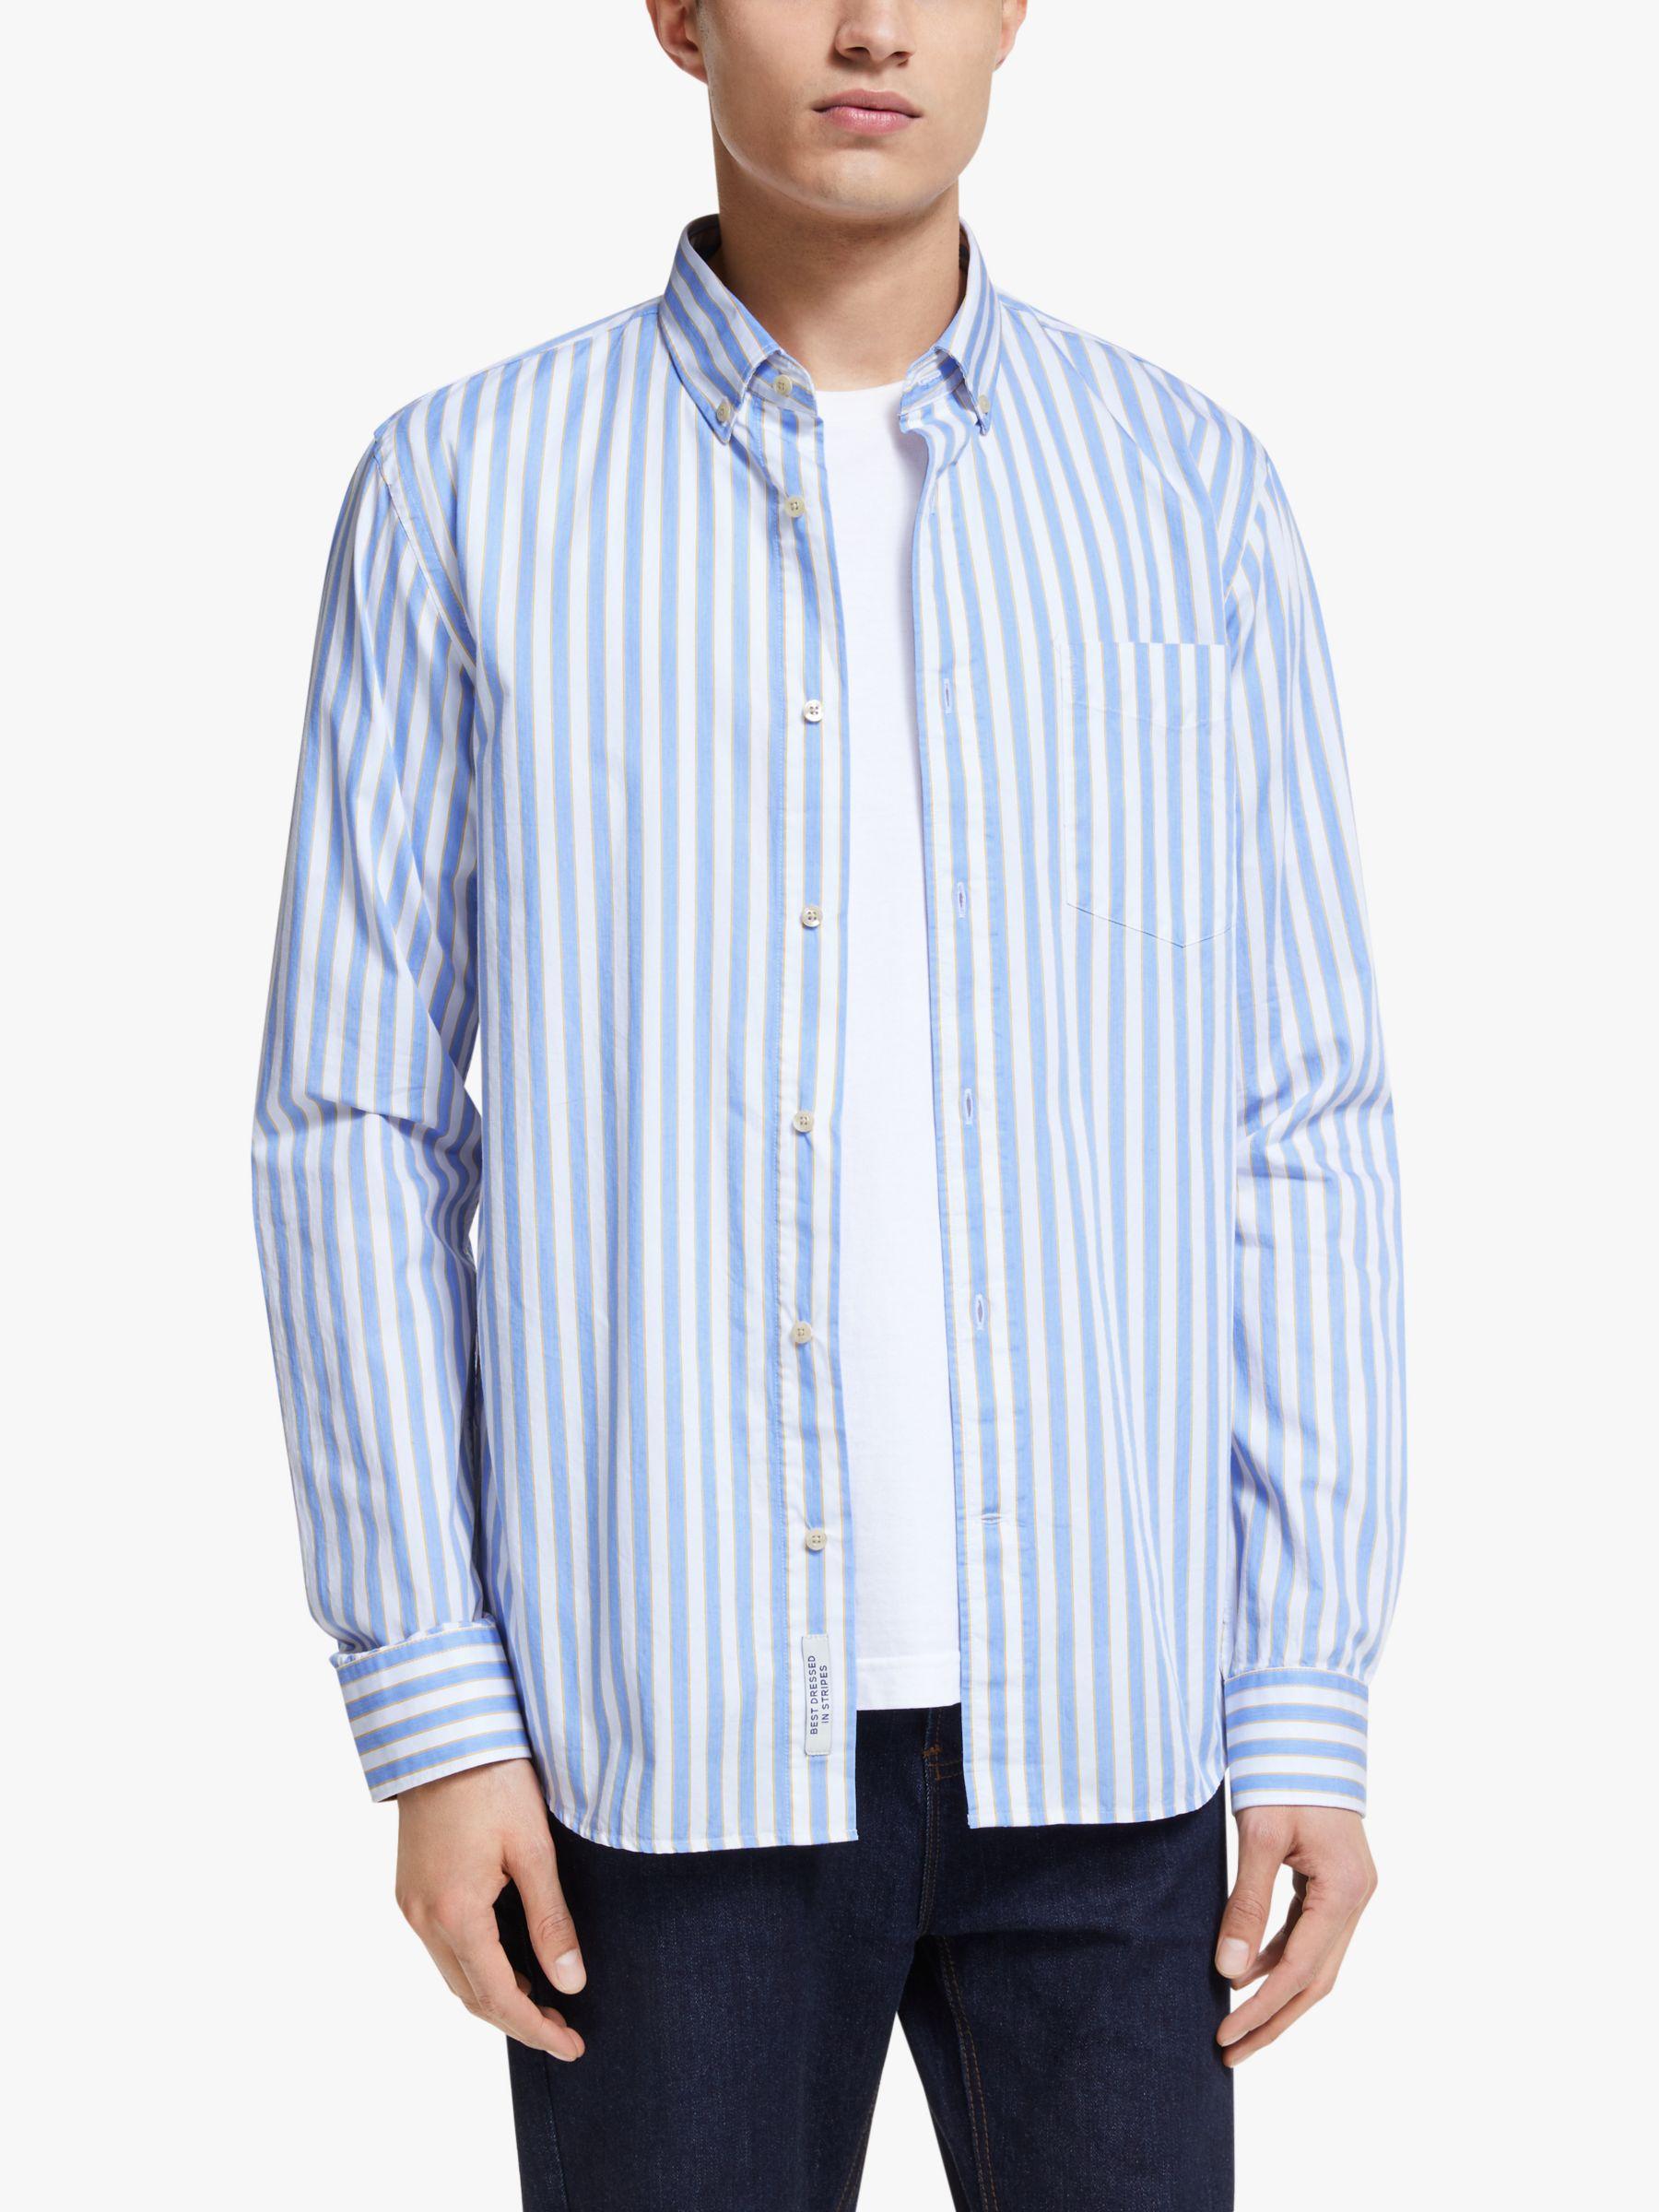 Scotch & Soda Scotch & Soda Yarn Dyed Stripe Shirt, Blue